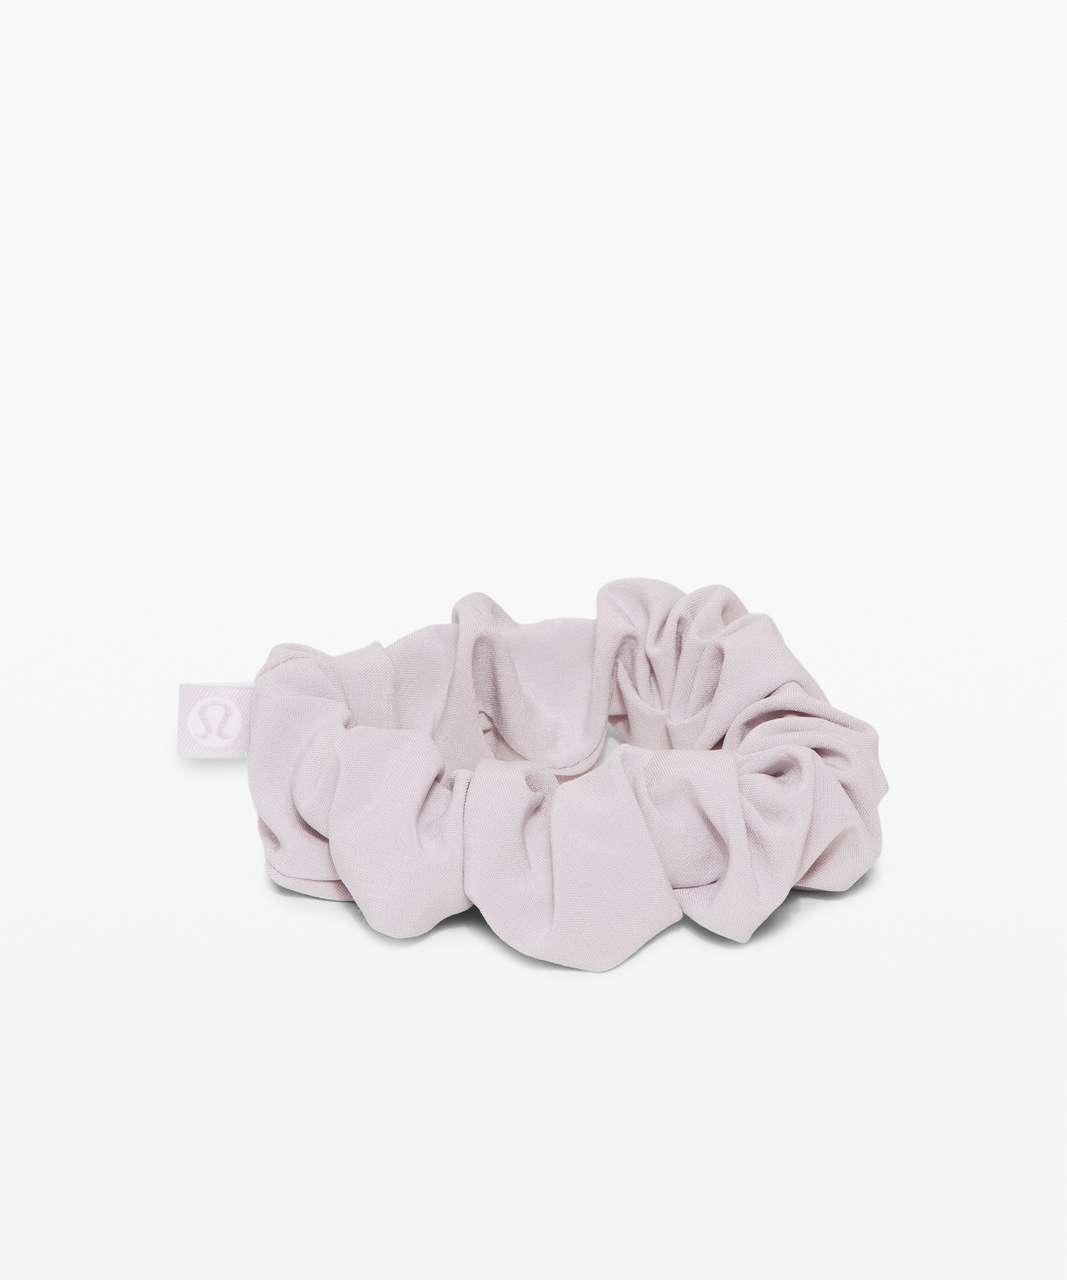 Lululemon Uplifting Scrunchie - Iced Iris